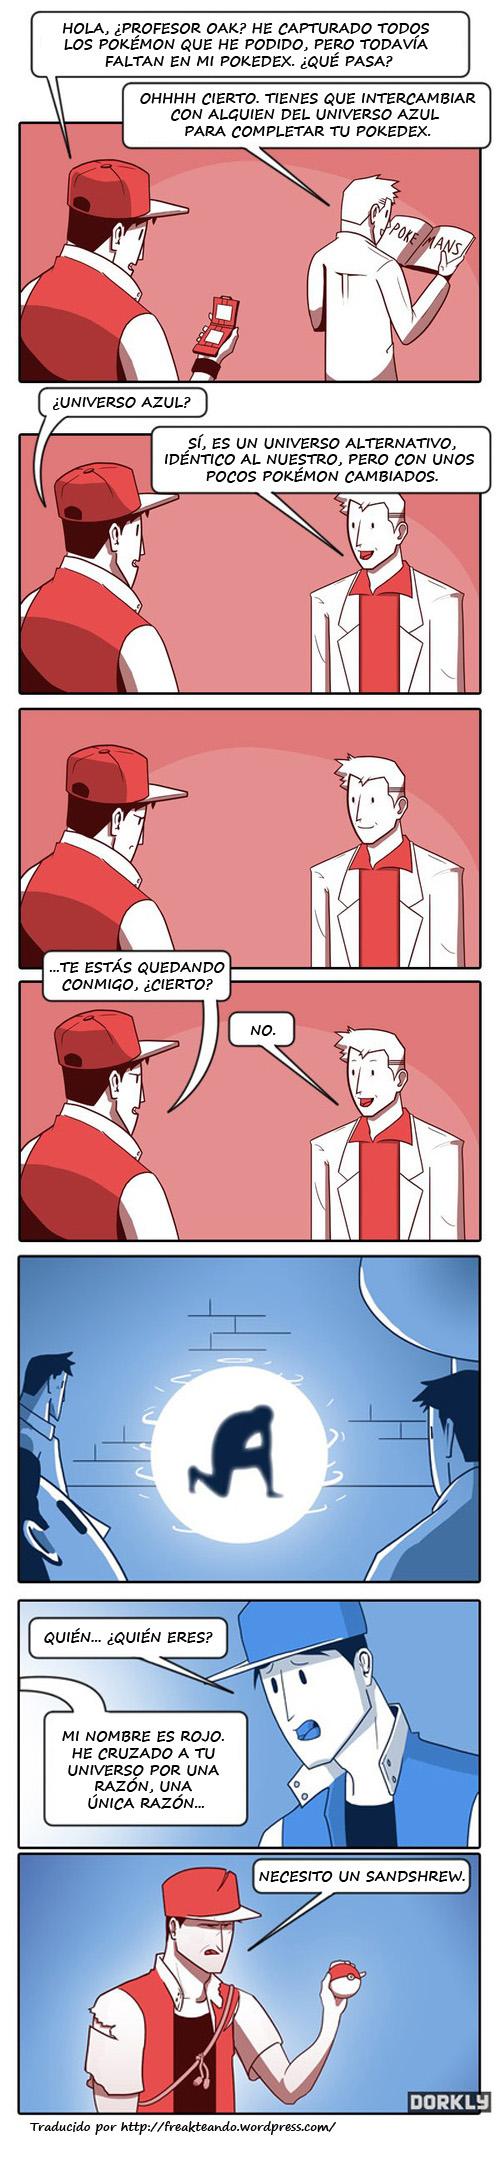 Viñeta_colección_pokémon_traducida